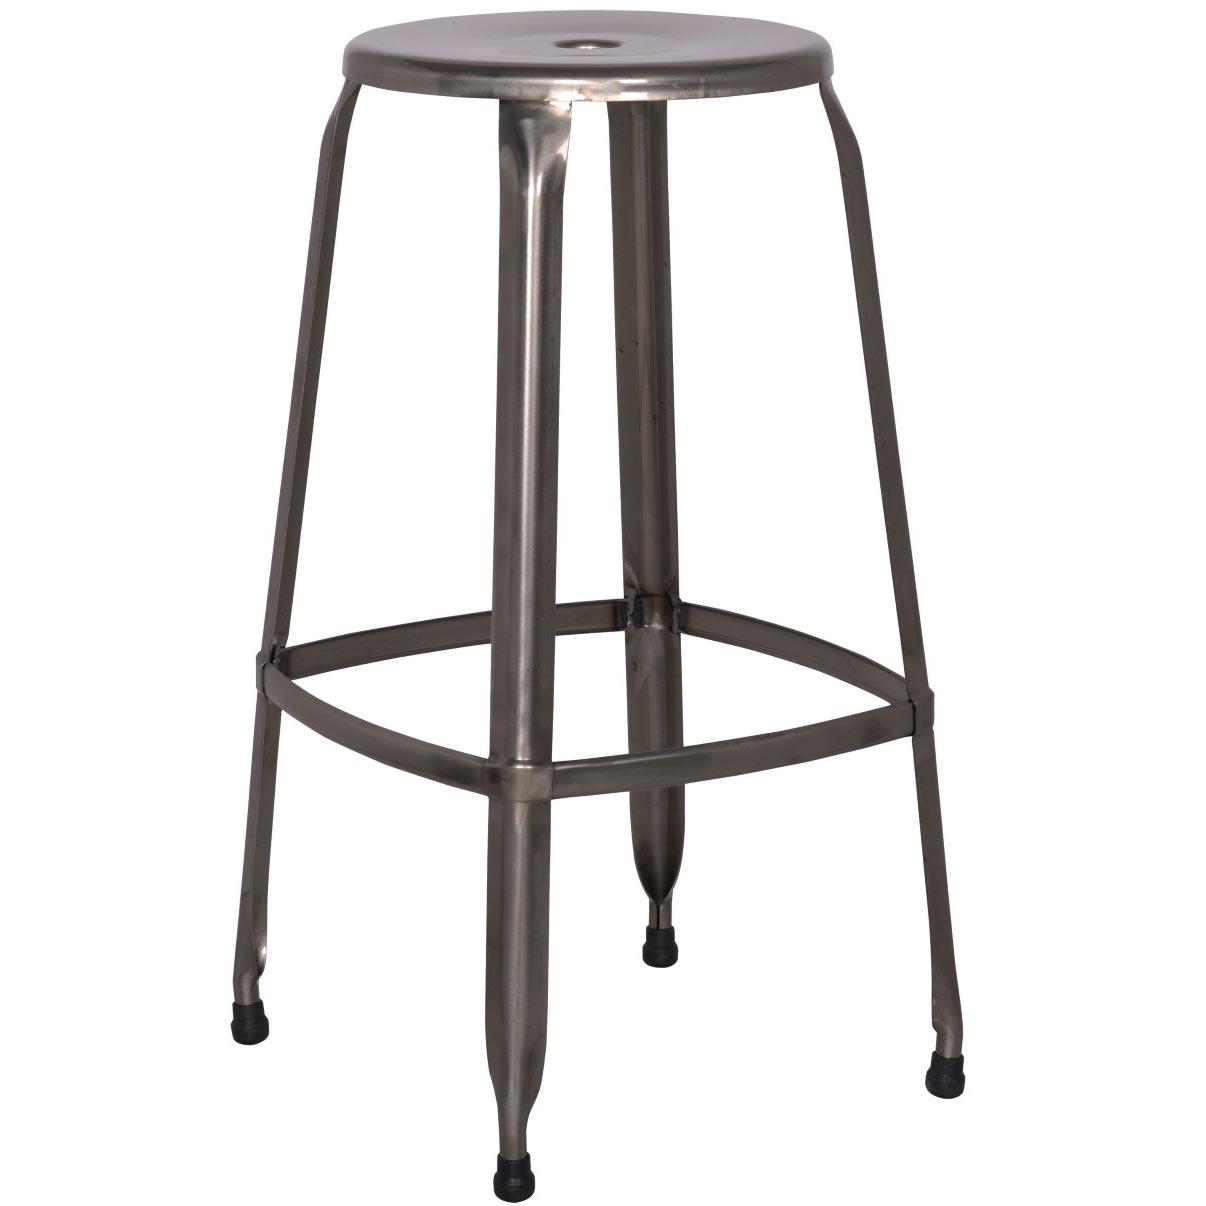 Pleasant Aria Metal Backless Bar Stool Gunmetal Creativecarmelina Interior Chair Design Creativecarmelinacom